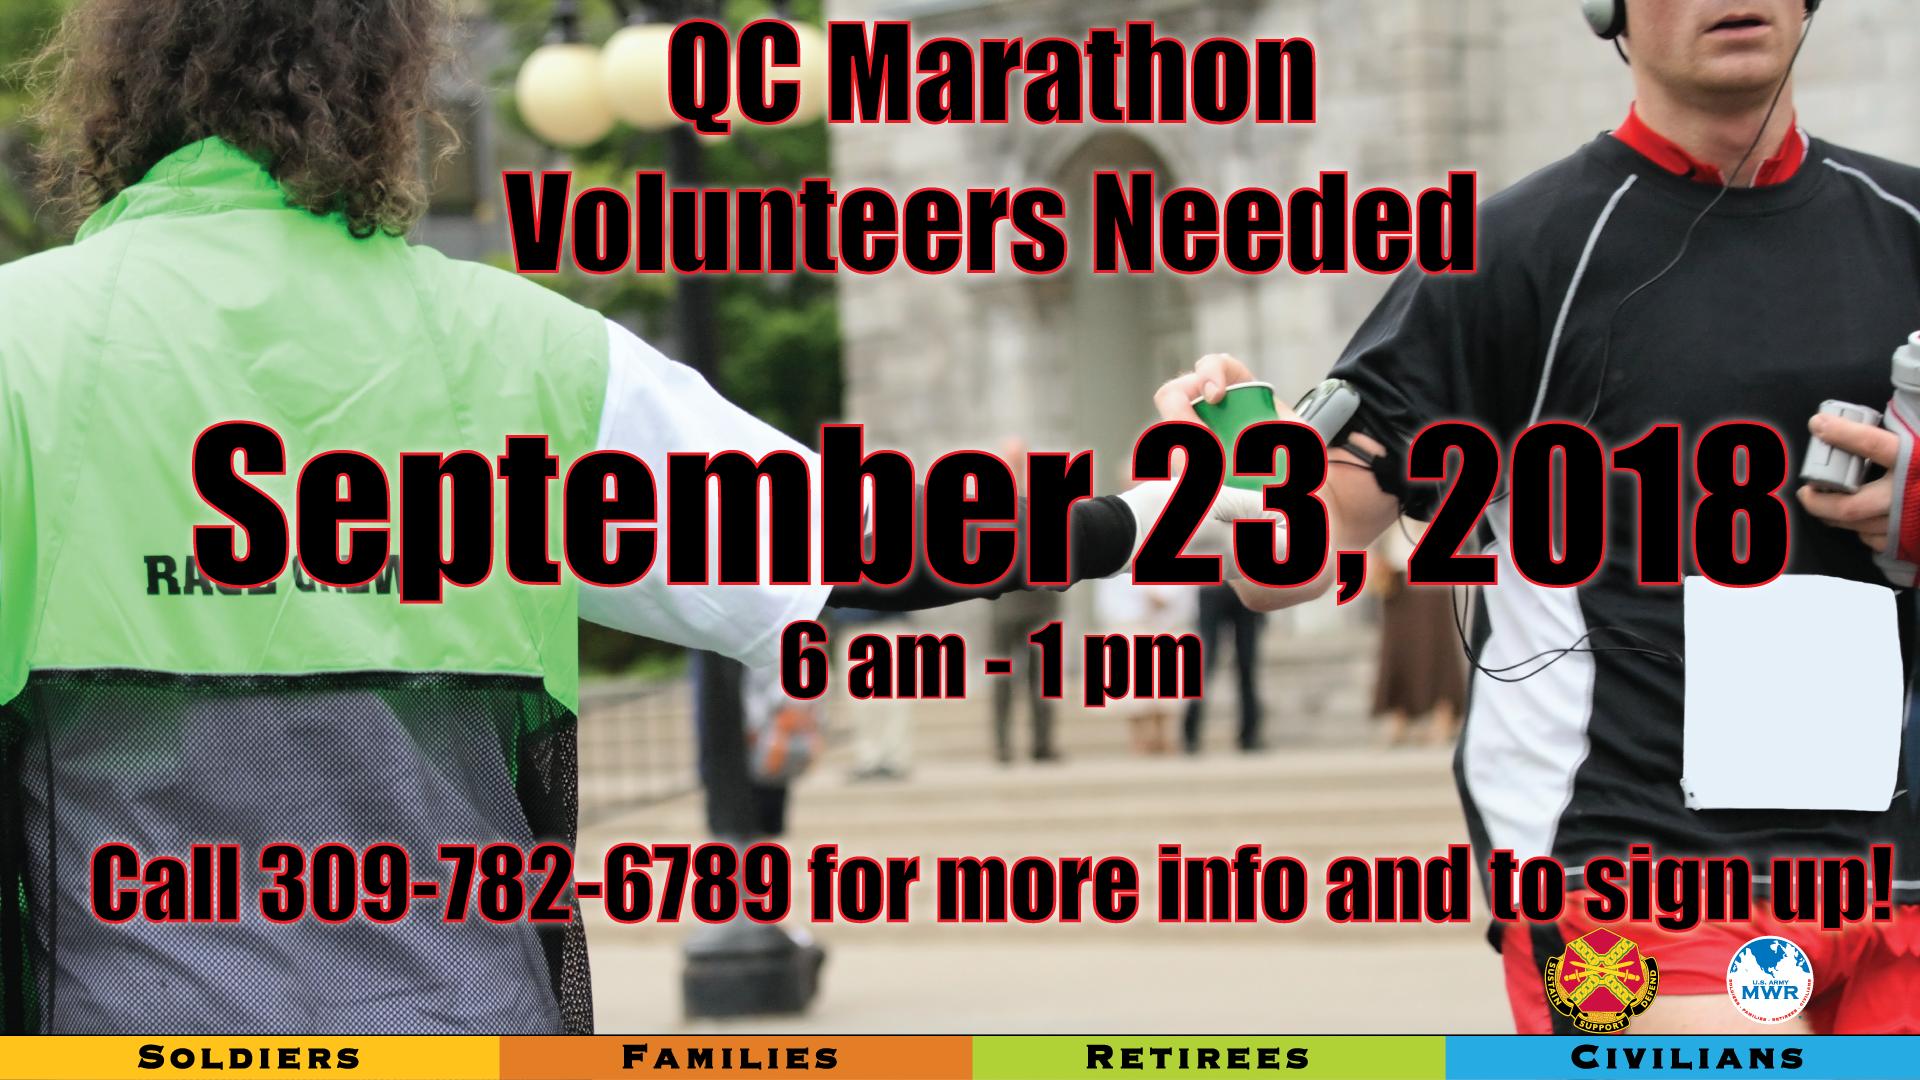 QC Marathon Volunteers Needed